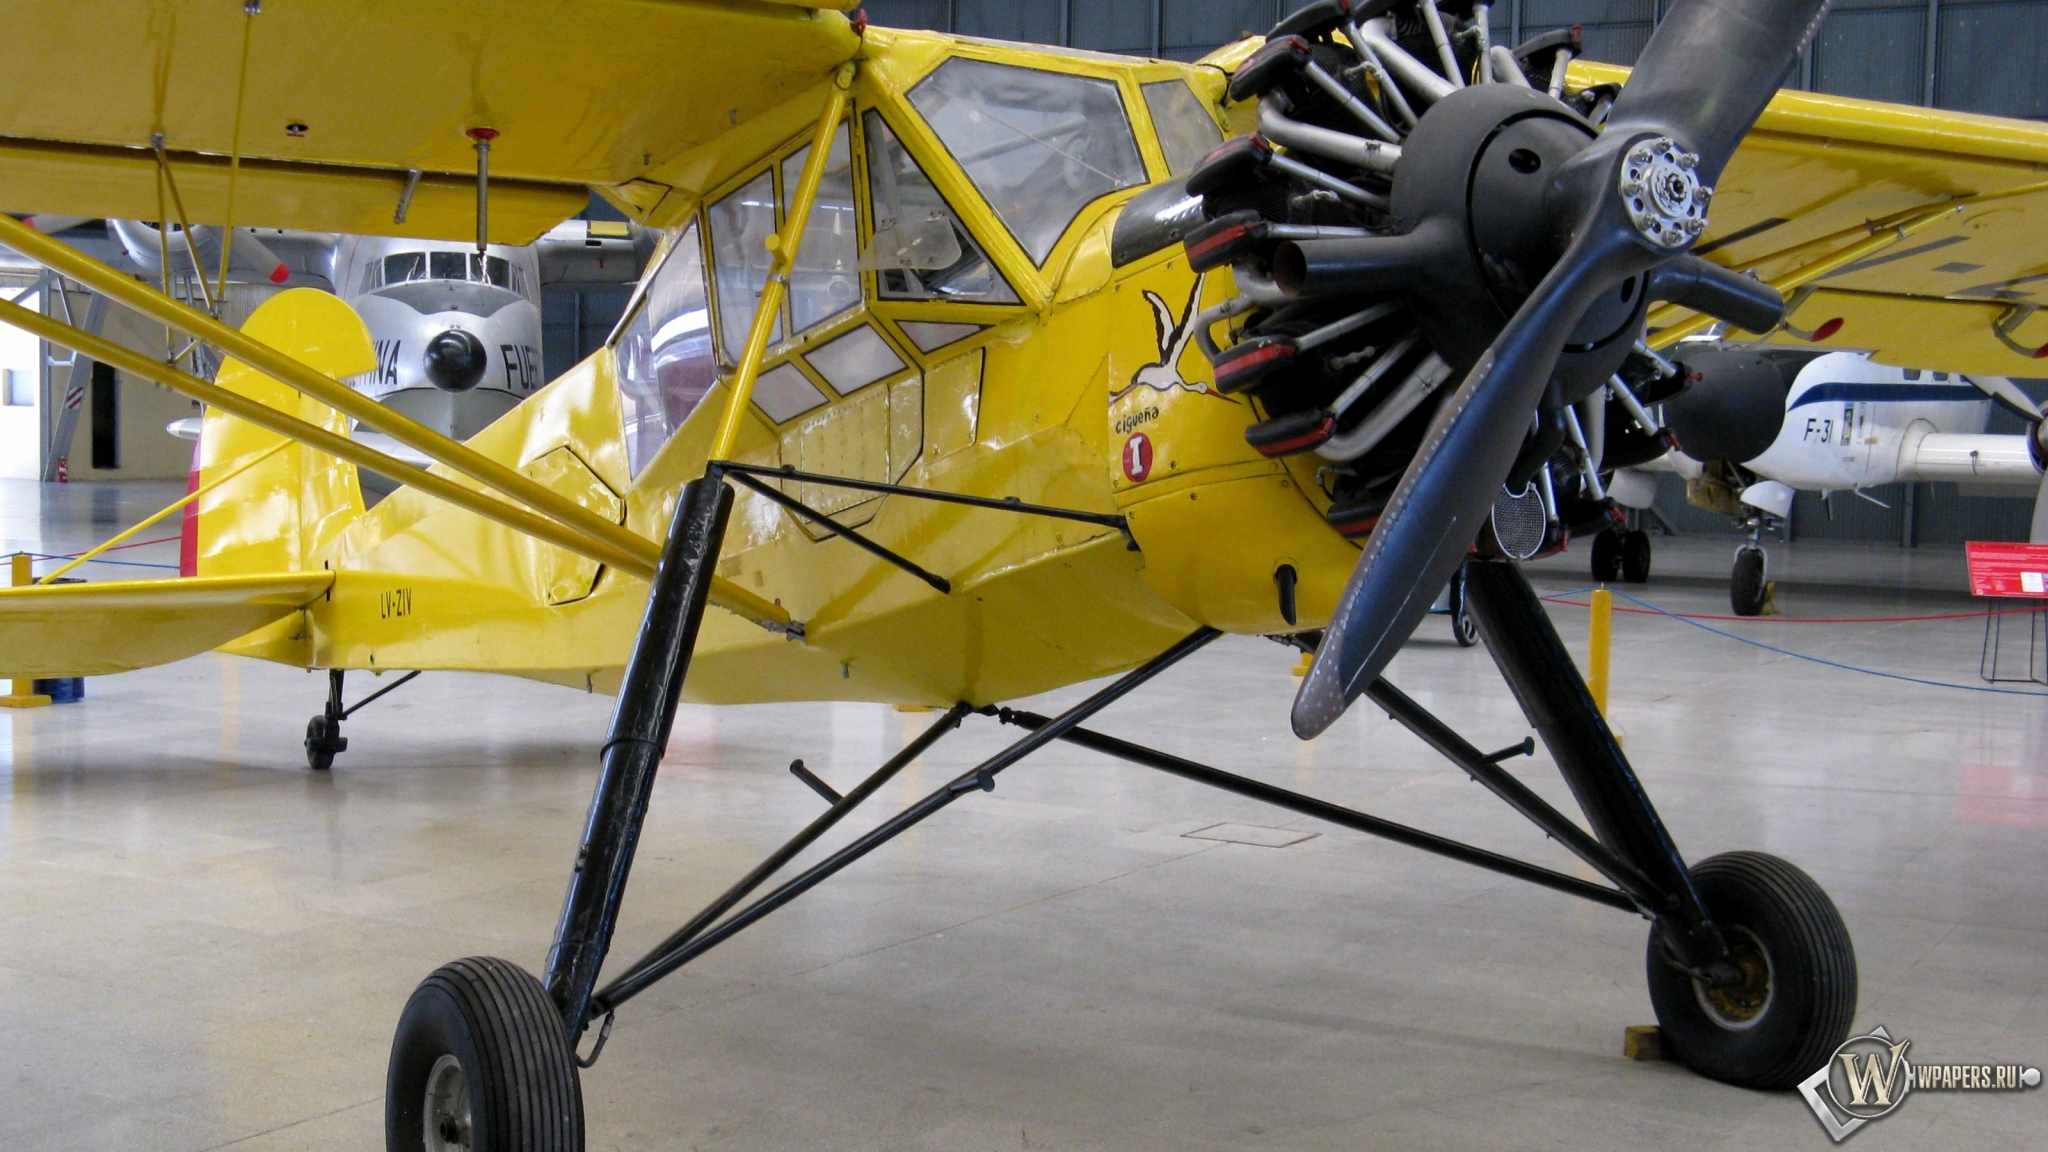 Fieseler Storch Fi-156 2048x1152